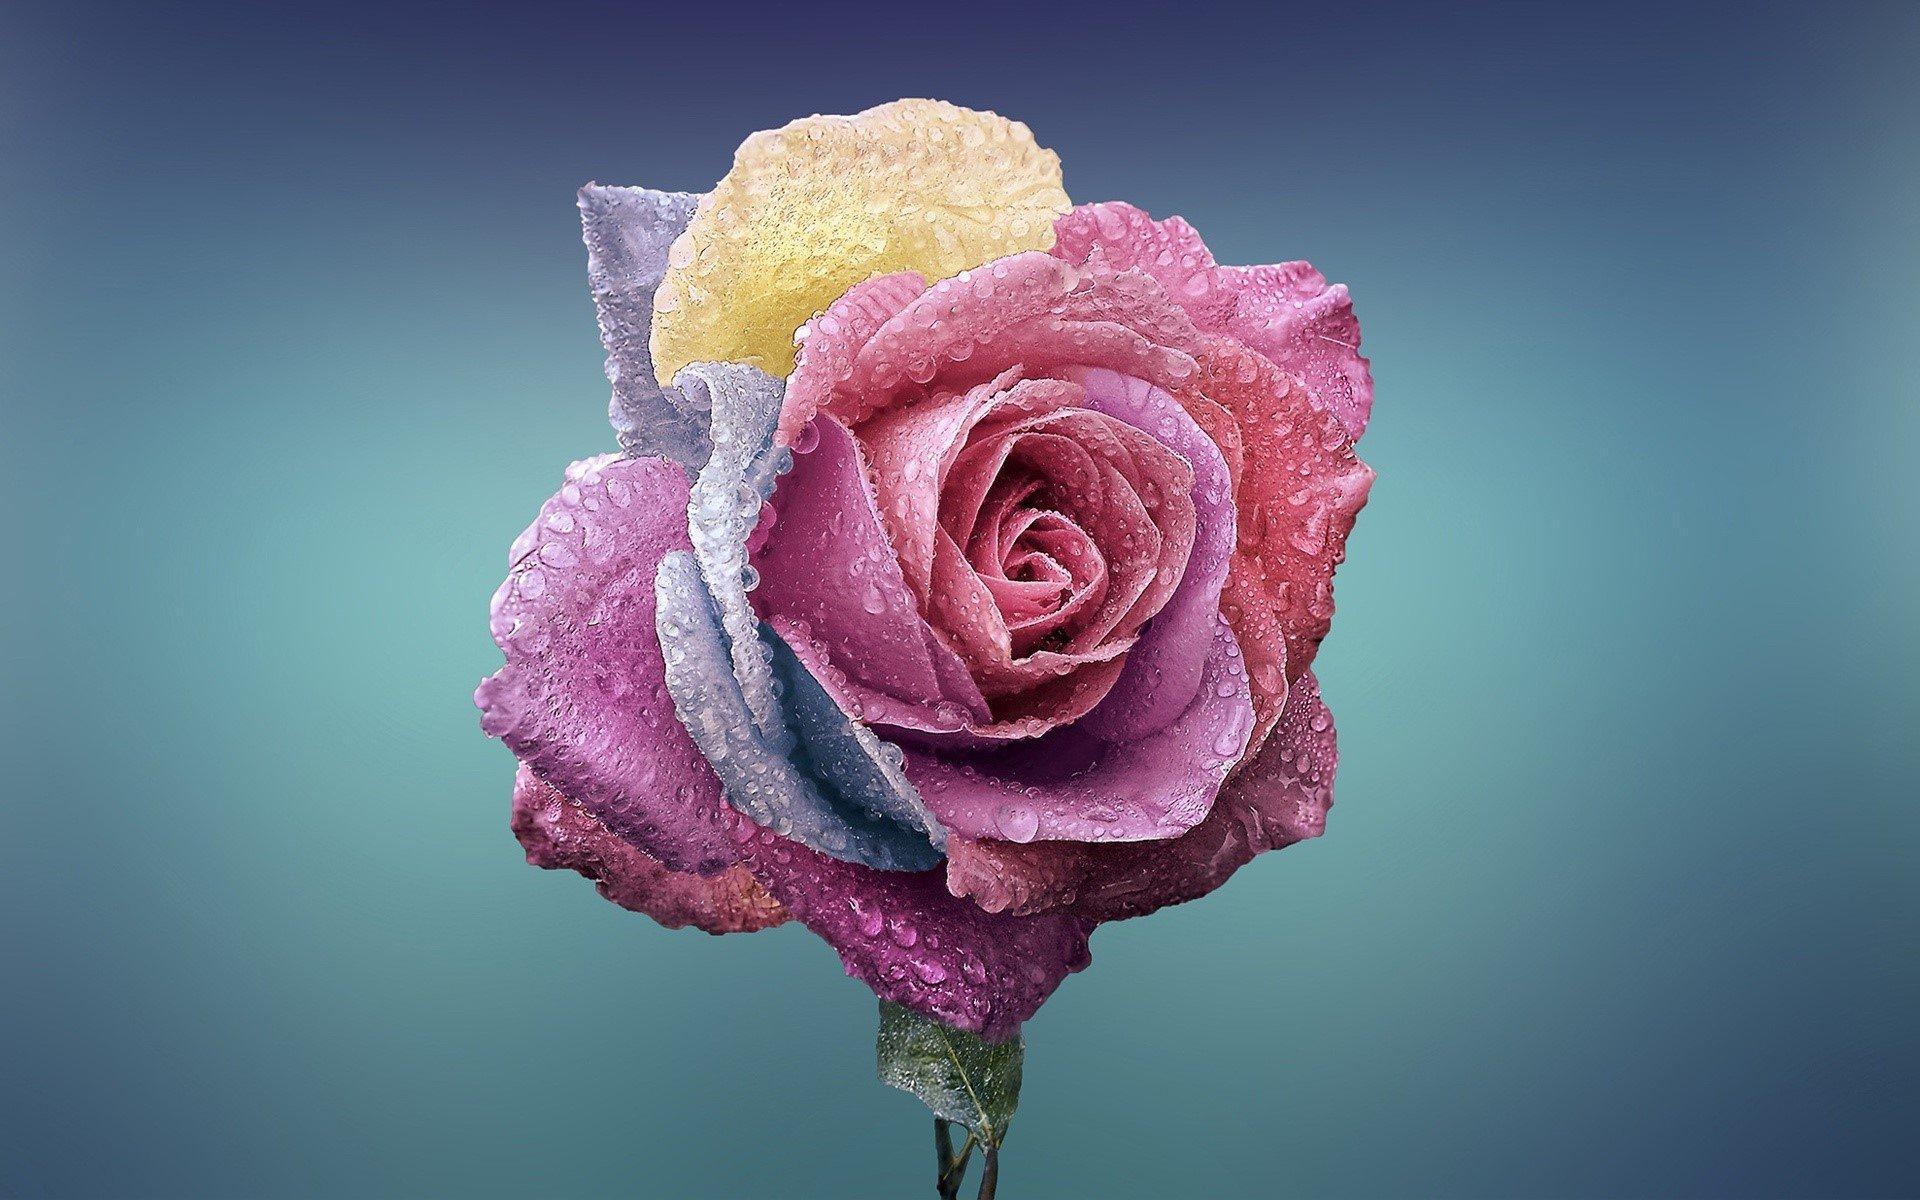 Fondos de pantalla Rosa de colores